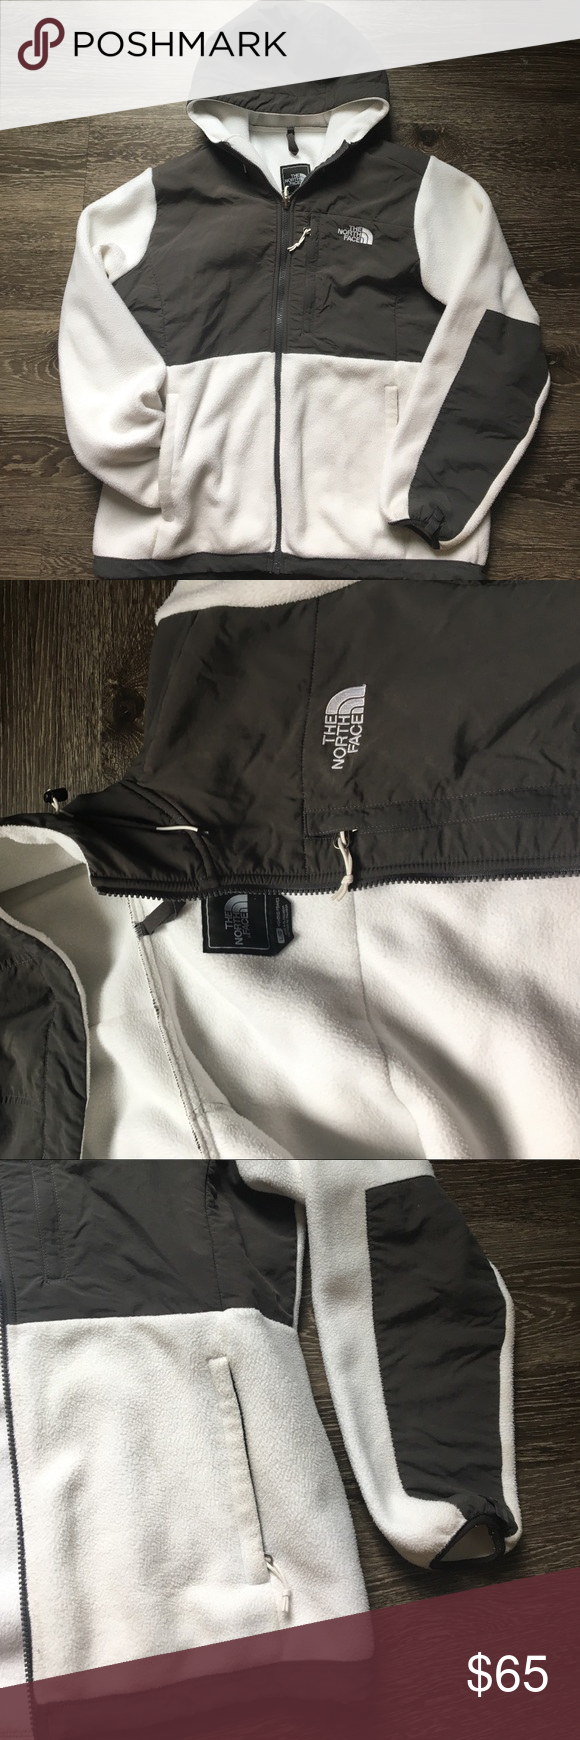 Grey u white fleece lined jacket utility jacket retail and gray